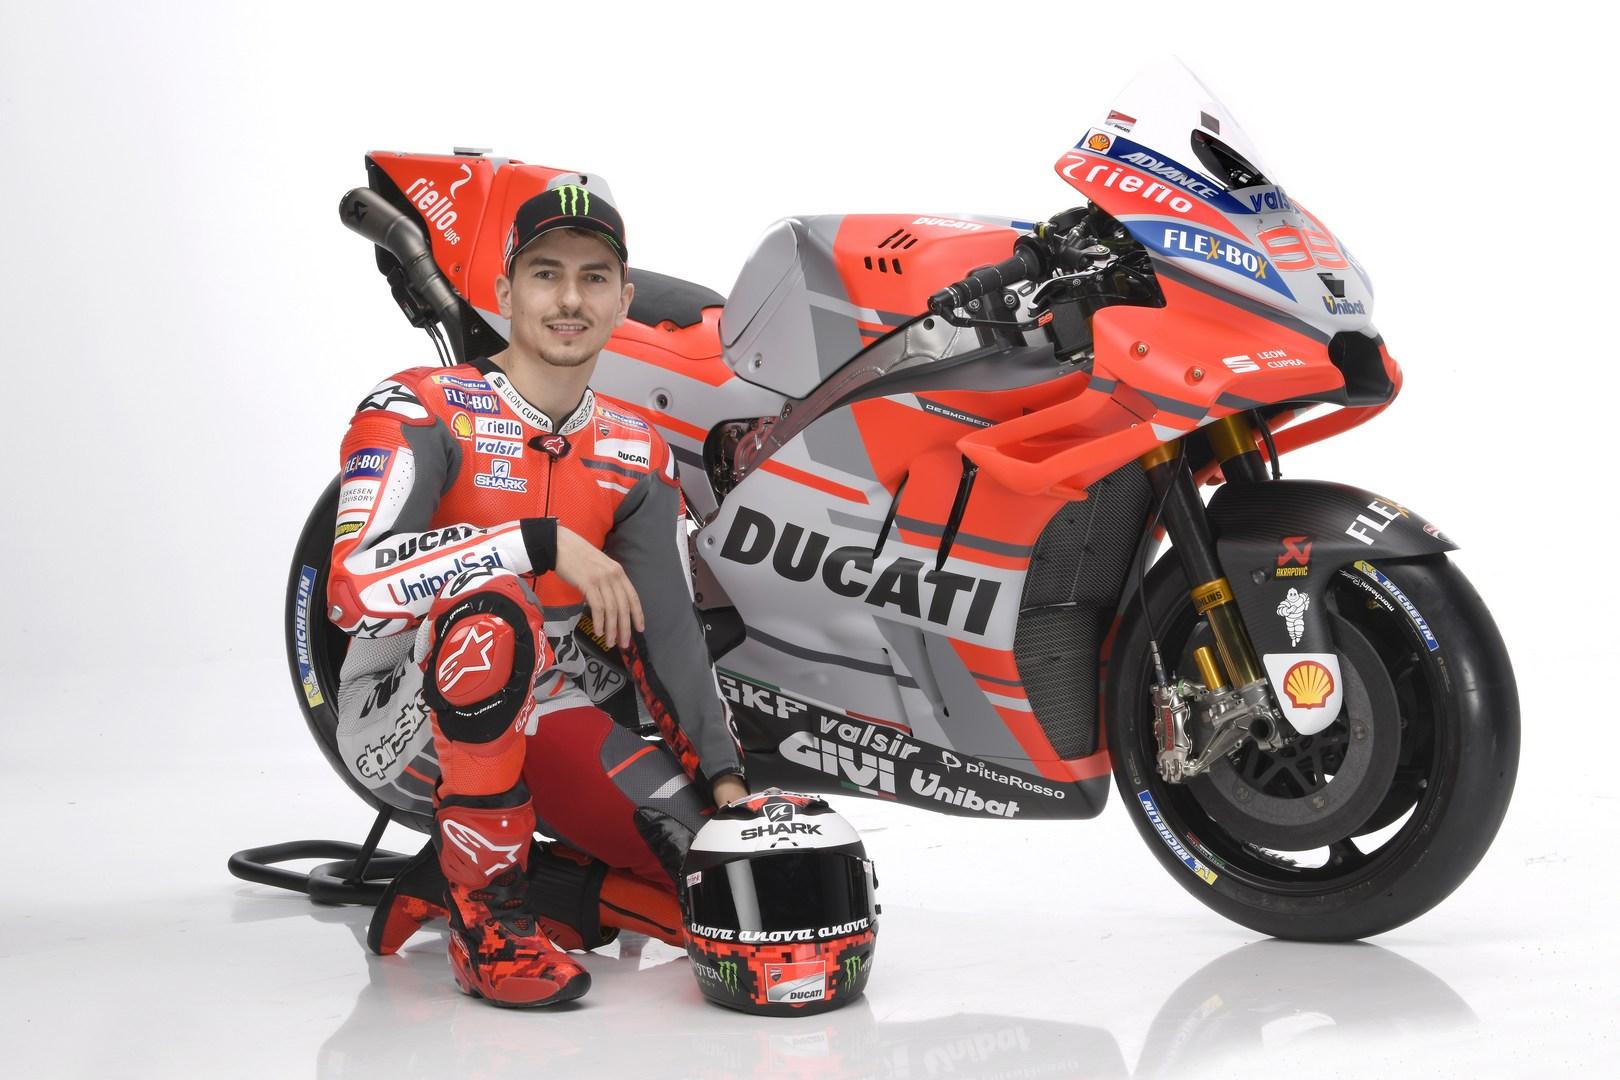 Ducati Desmosedici GP18